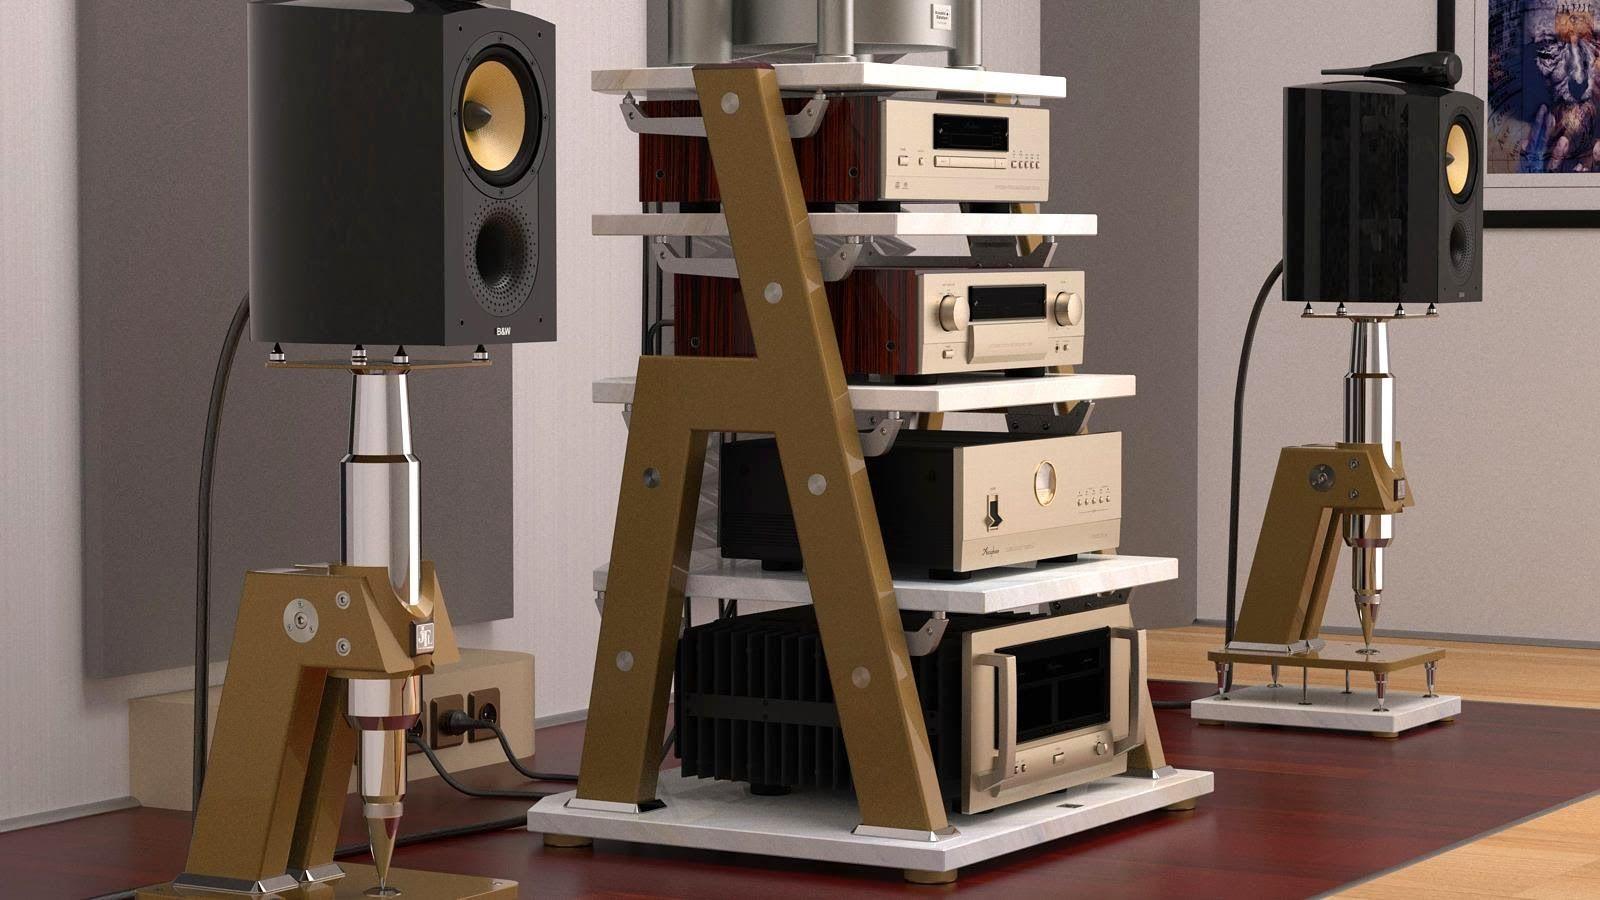 Jtl Amazing Speaker Stands